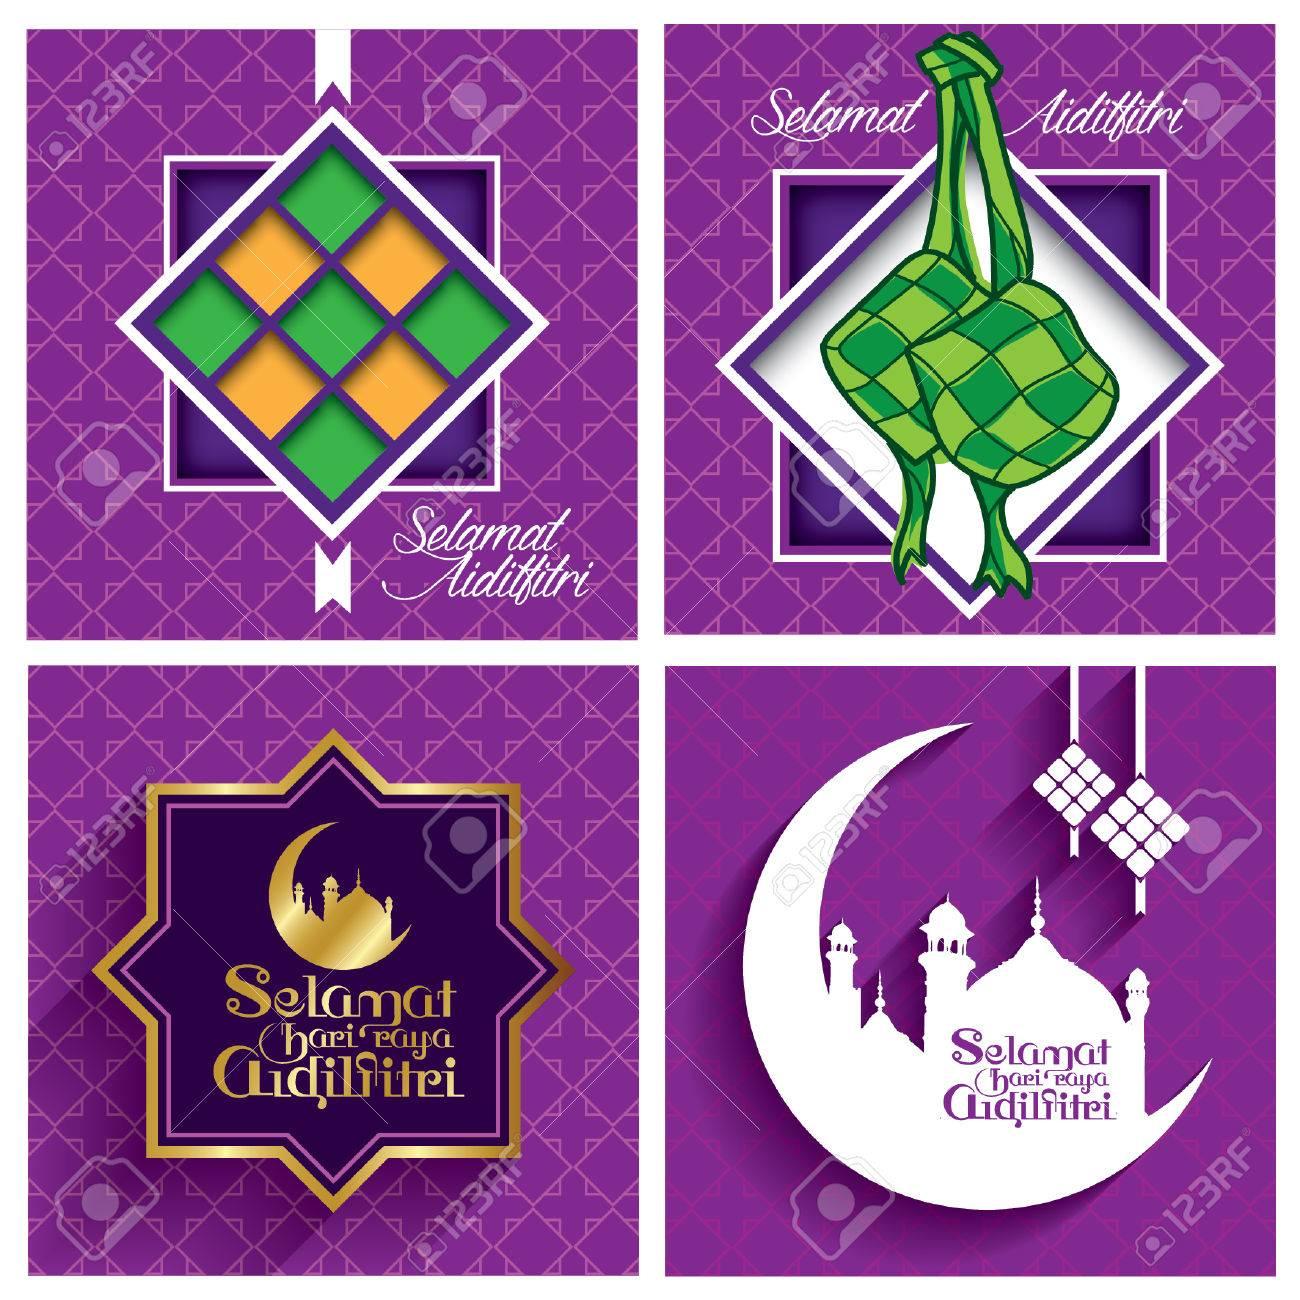 4 Set of Selamat Hari Raya Aidilfitri Vector Design (Translation: Celebration of Breaking Fast) - 77669945